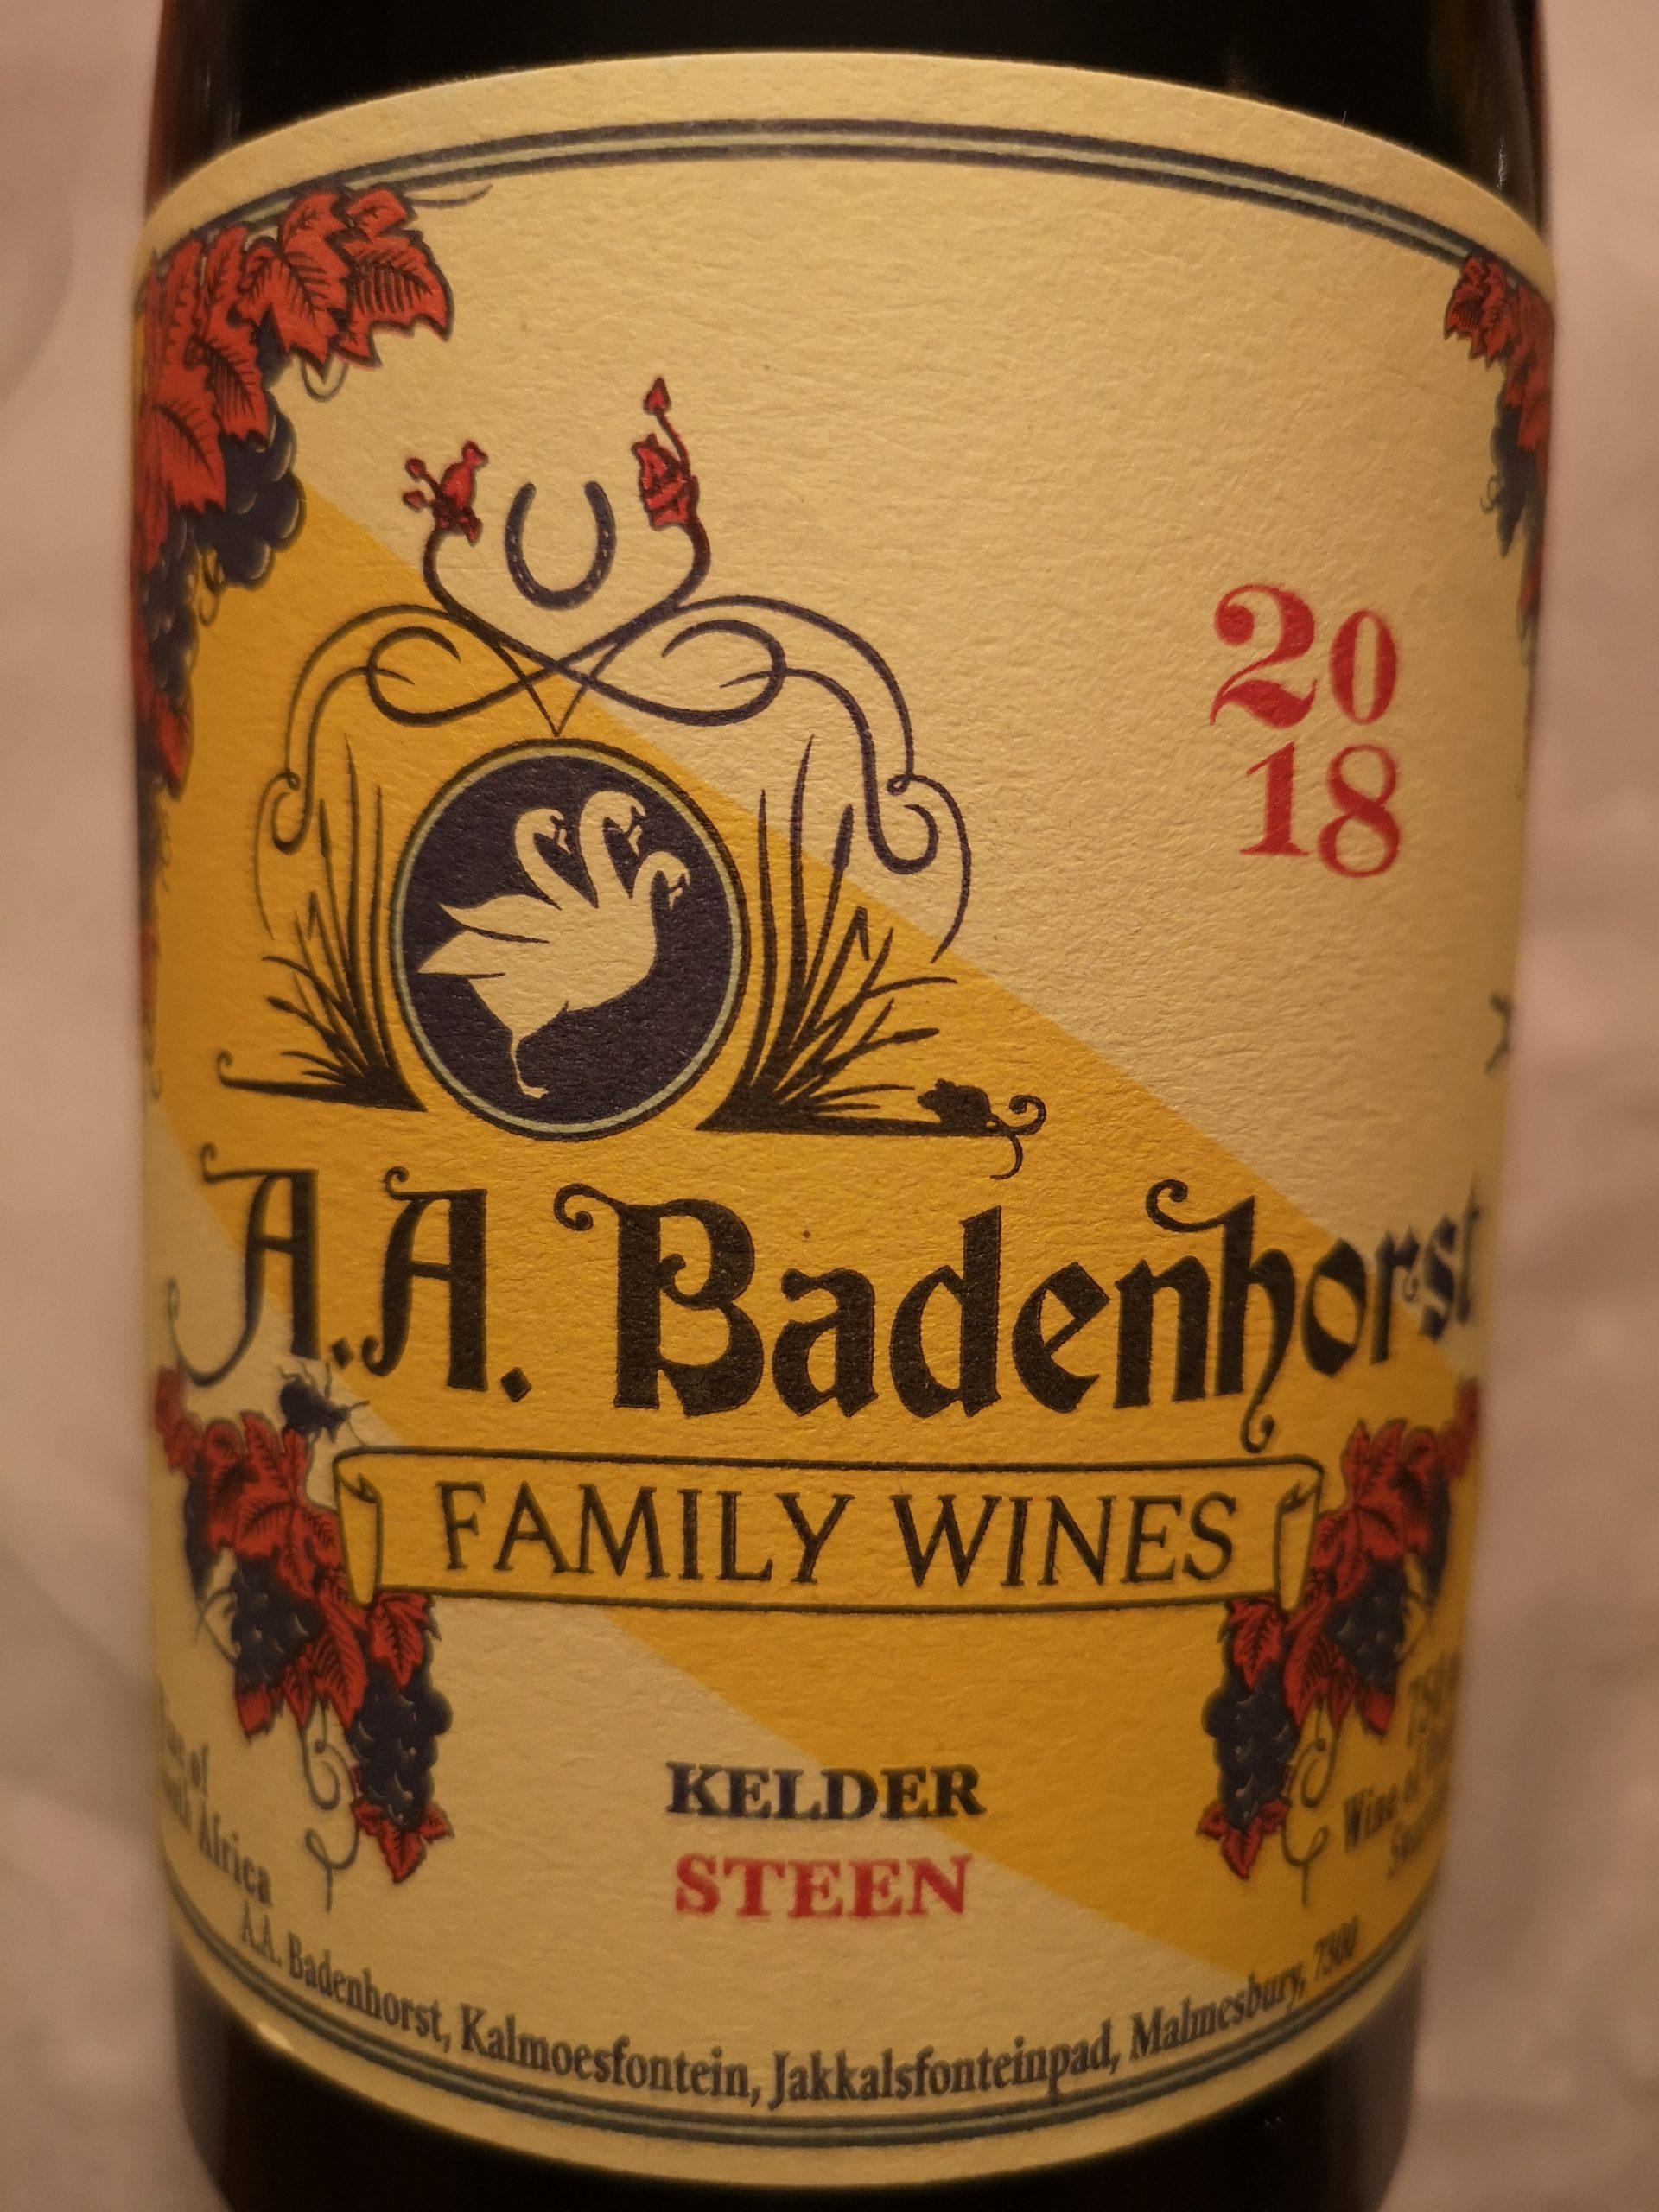 2018 Chenin Blanc Kelder Steen | A.A. Badenhorst